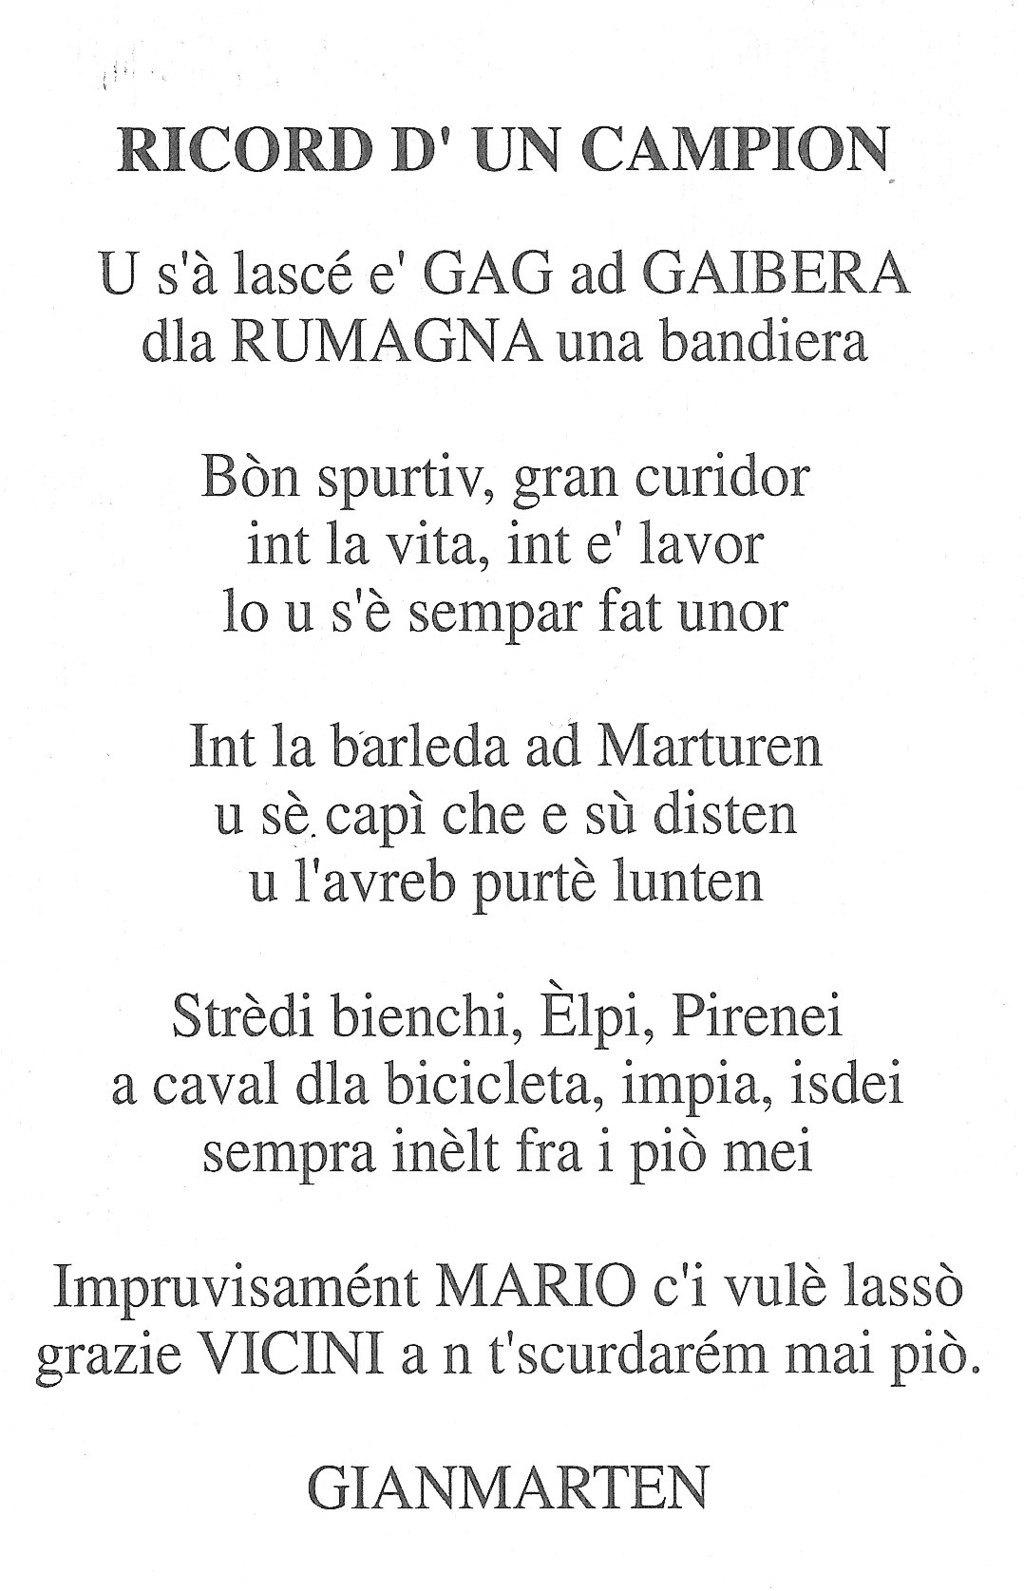 poesia gianmarten